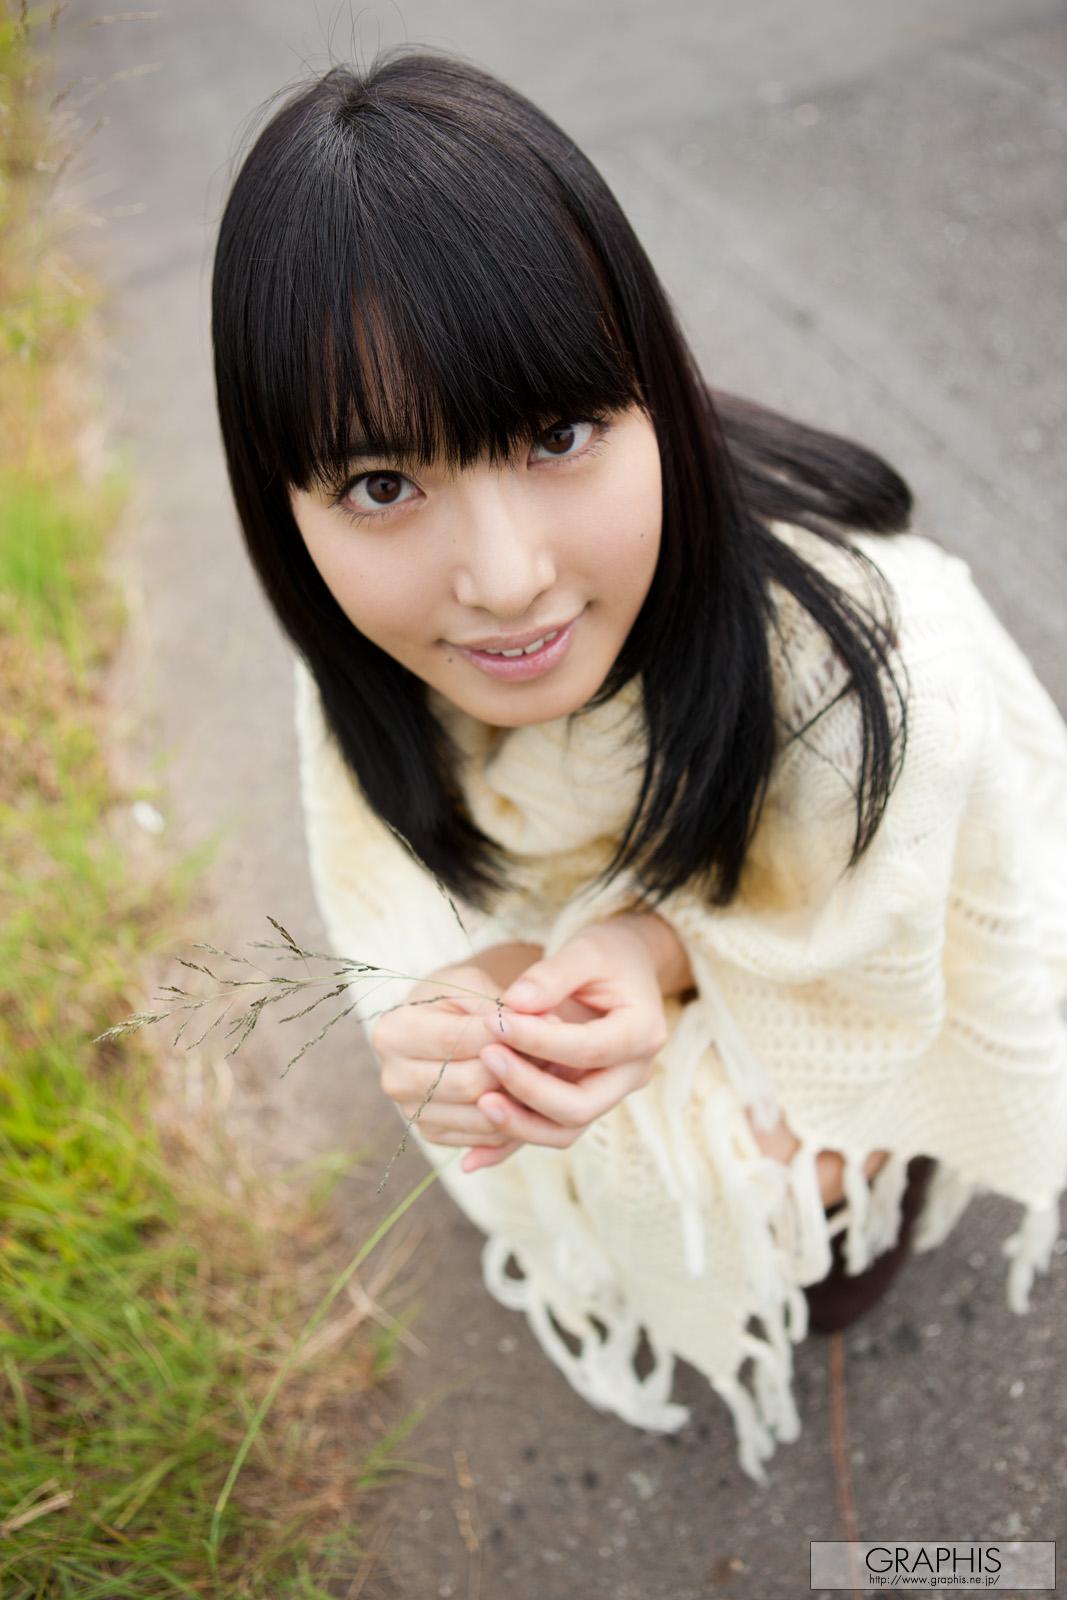 gra_kana-y_sp2002